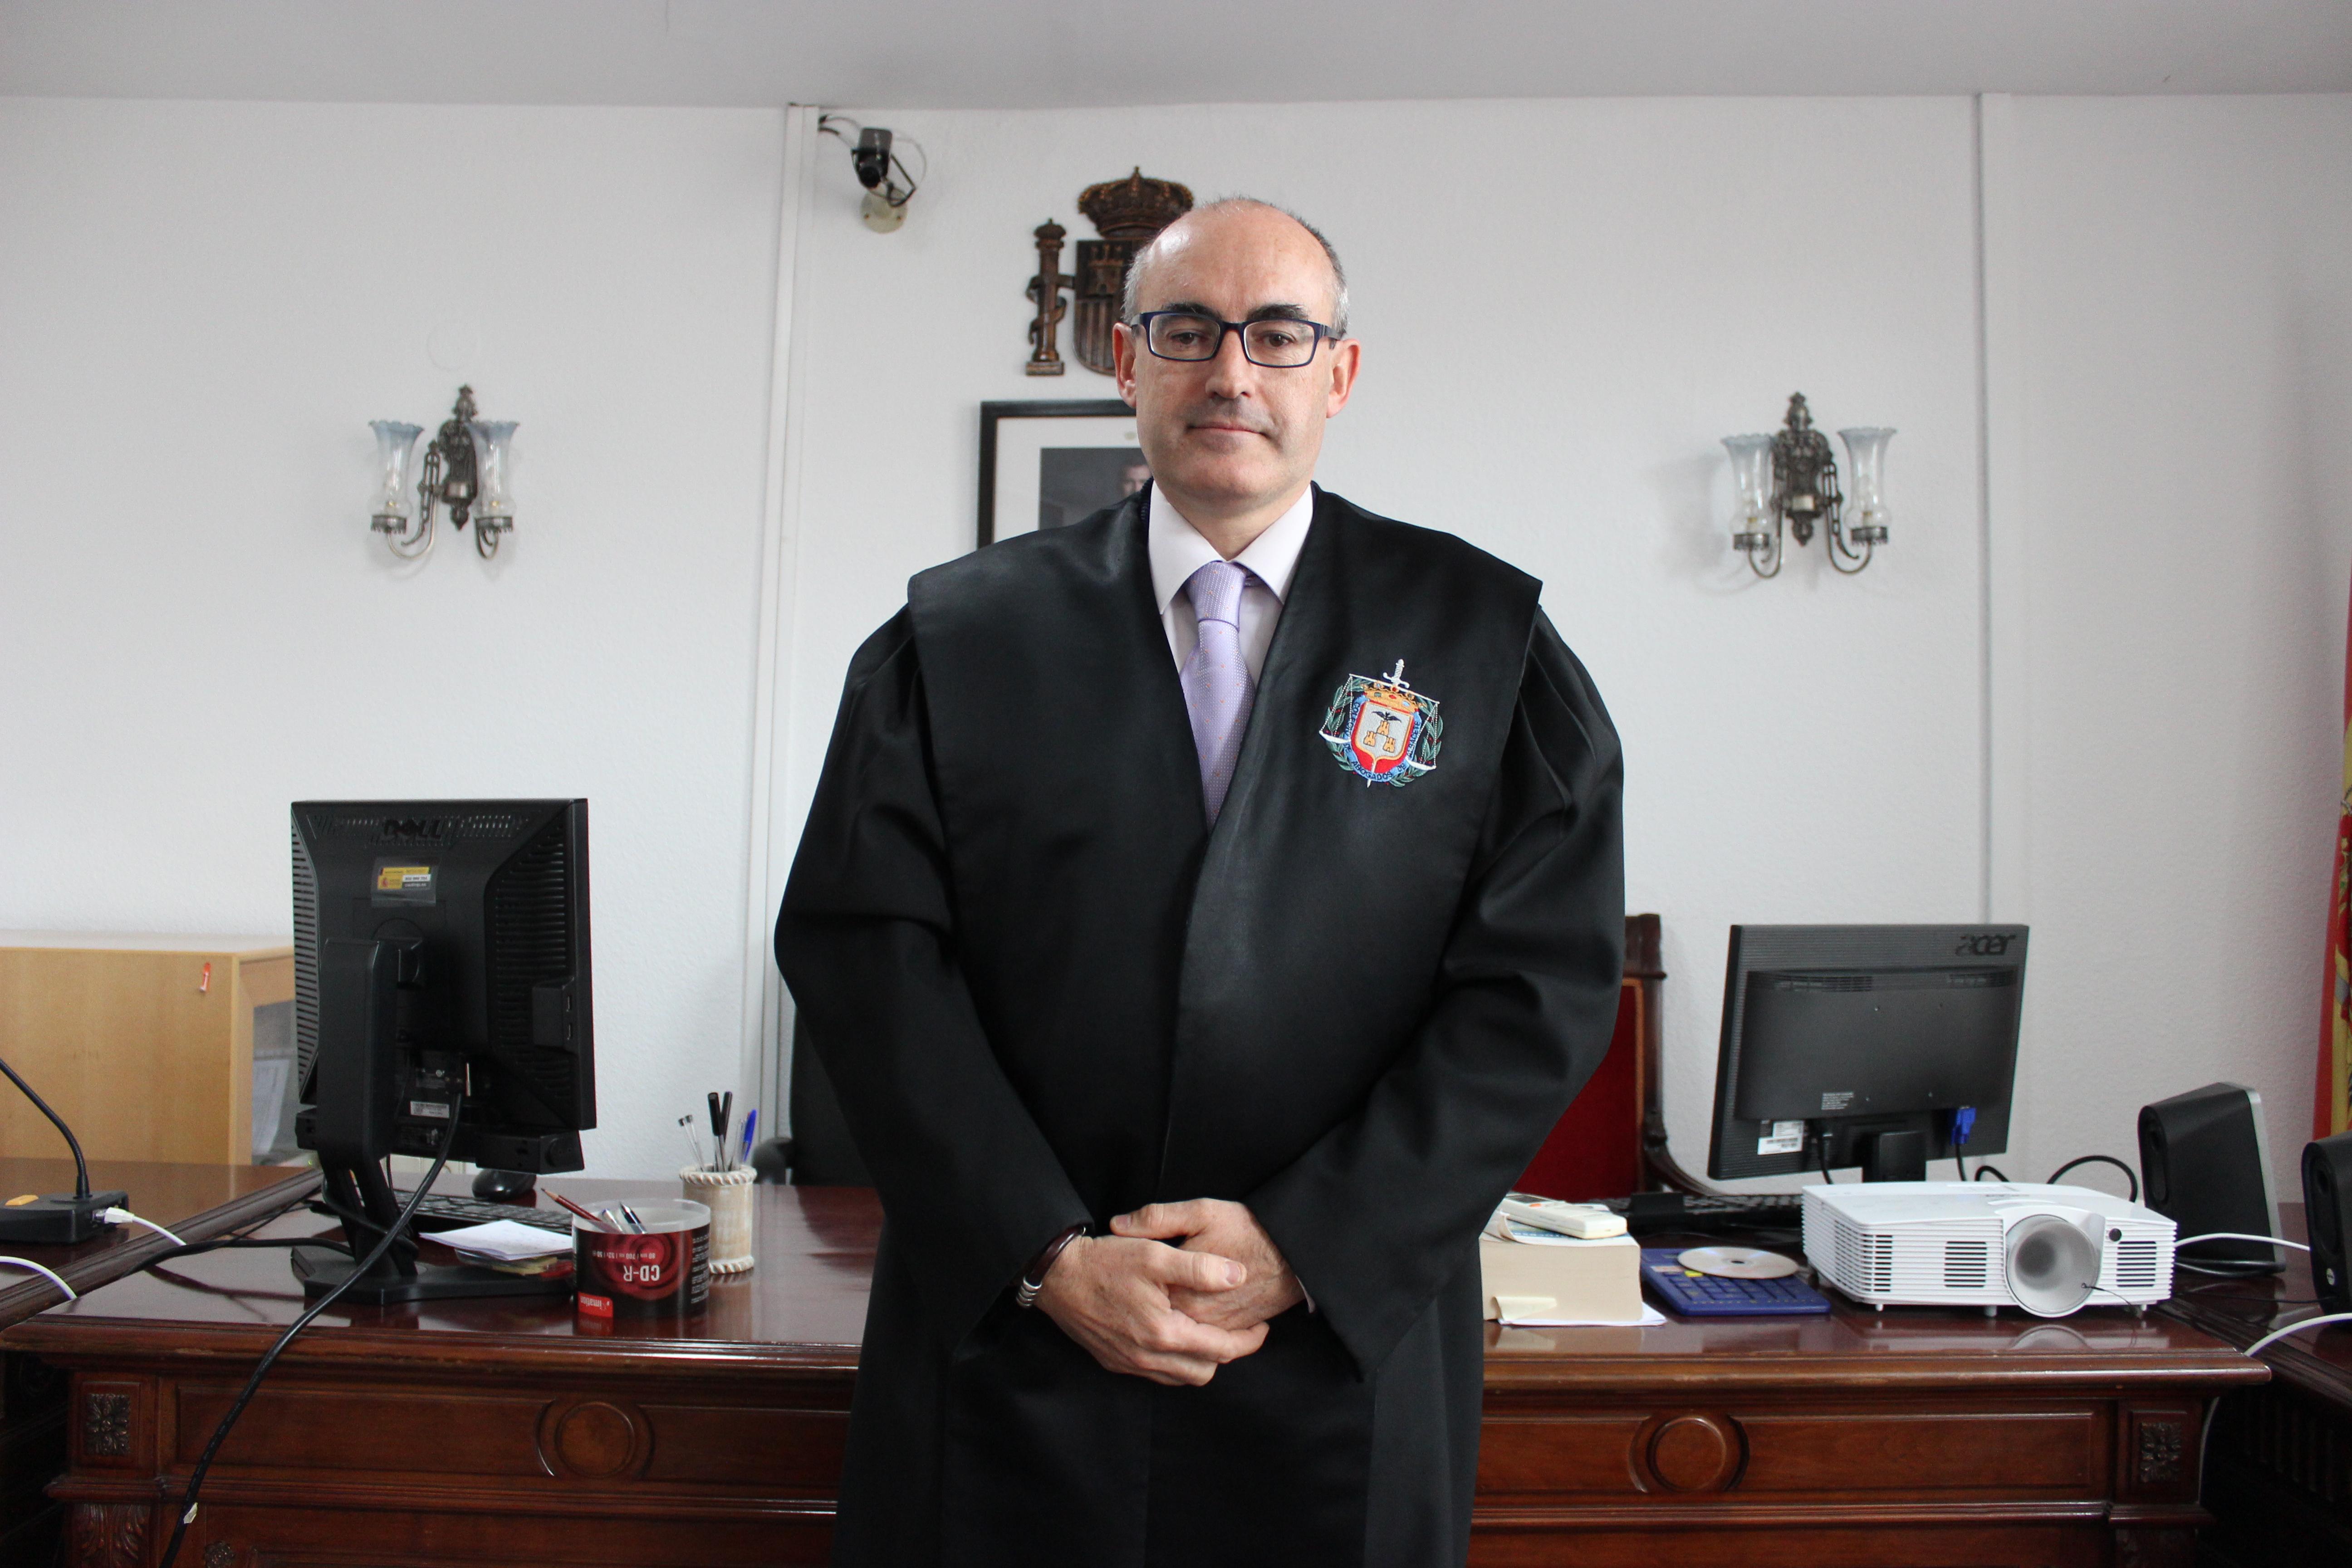 Miguel Angel Gonzalez Garcia